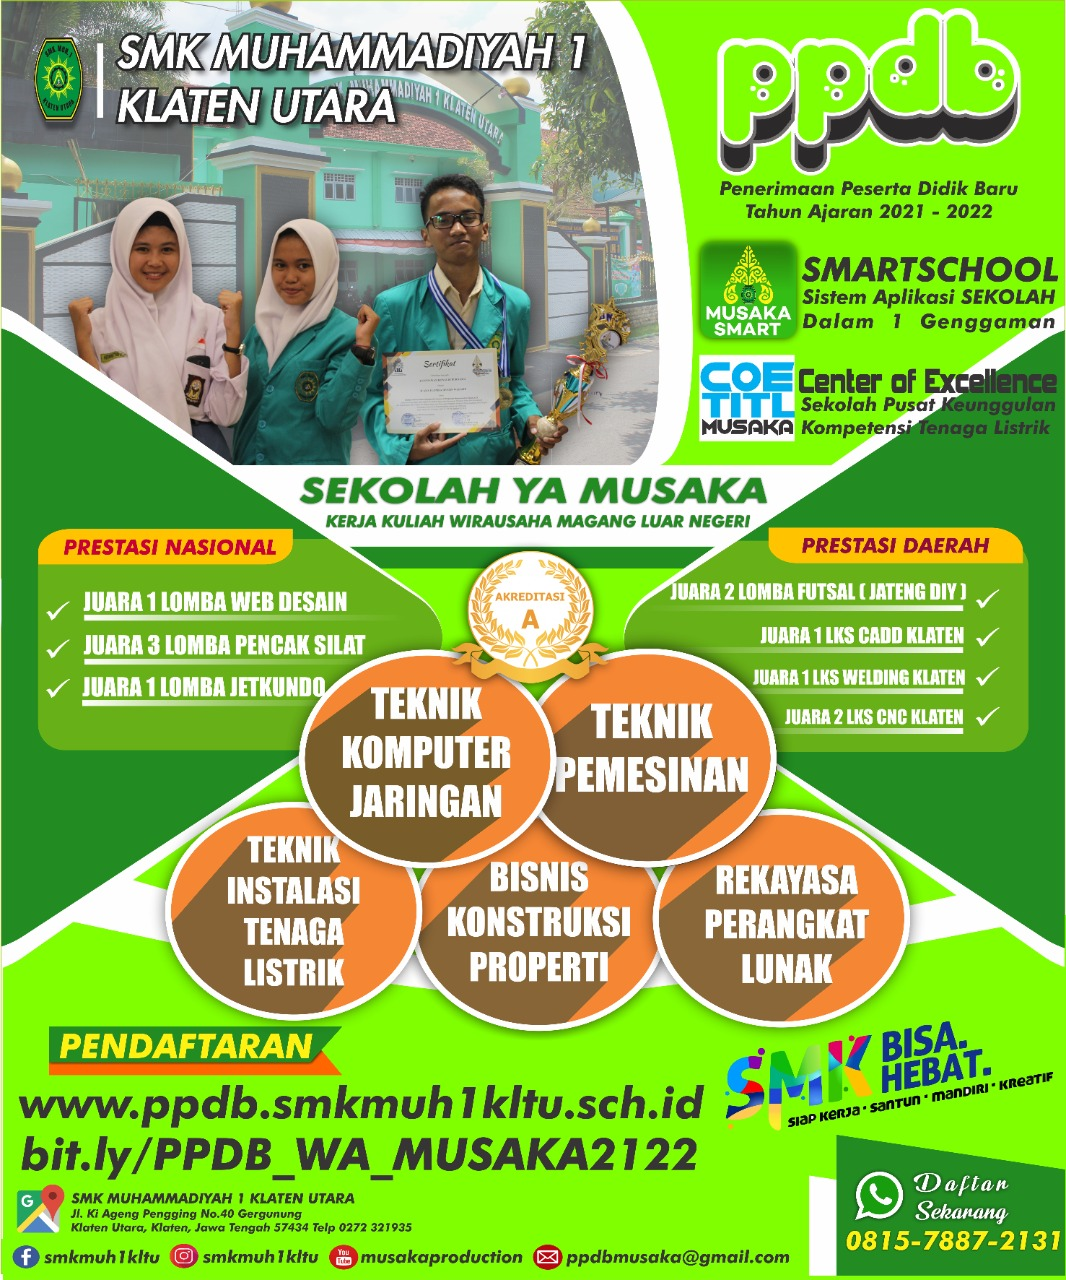 PPDB SMK Muhammadiyah 1 Klaten Utara bisa menerima penitipan calon siswa baru